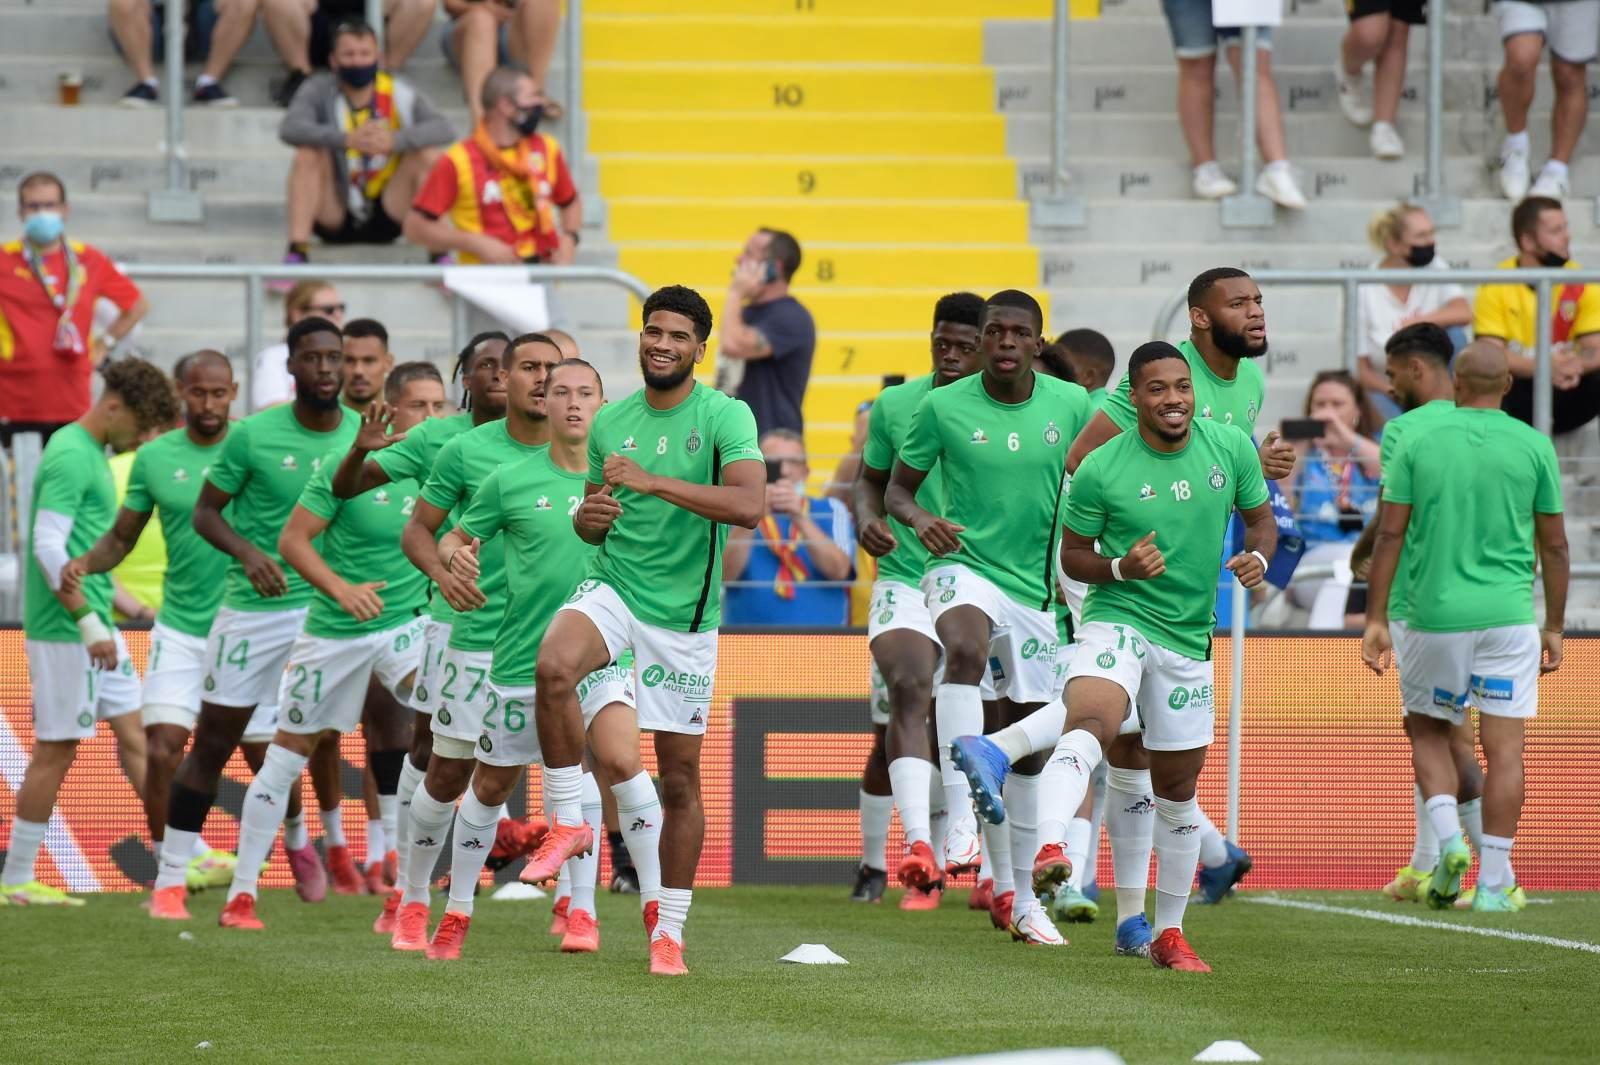 «Сент-Этьен» - «Бордо»: прогноз и ставка на матч Лиги 1 – 18 сентября2021